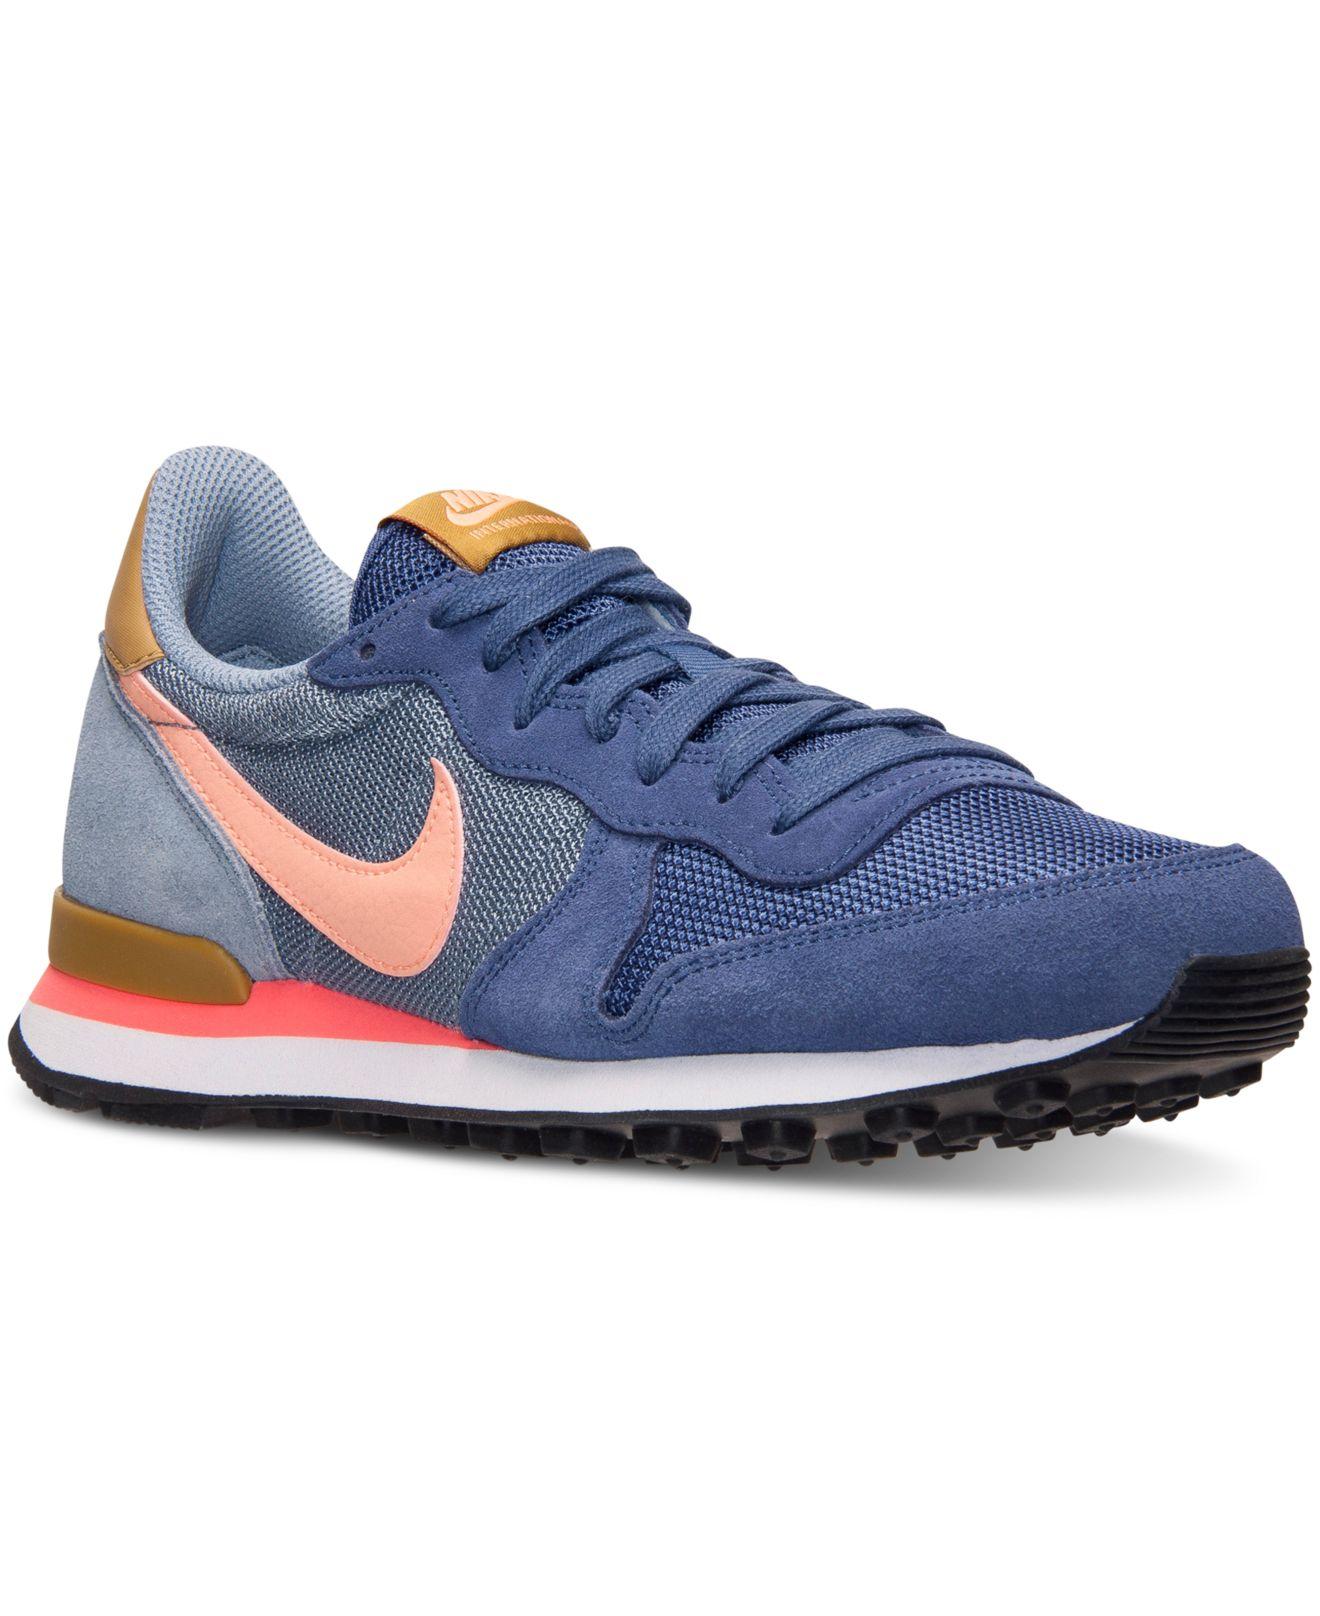 b182be4687e Lyst - Nike Women s Internationalist Casual Sneakers From Finish ...